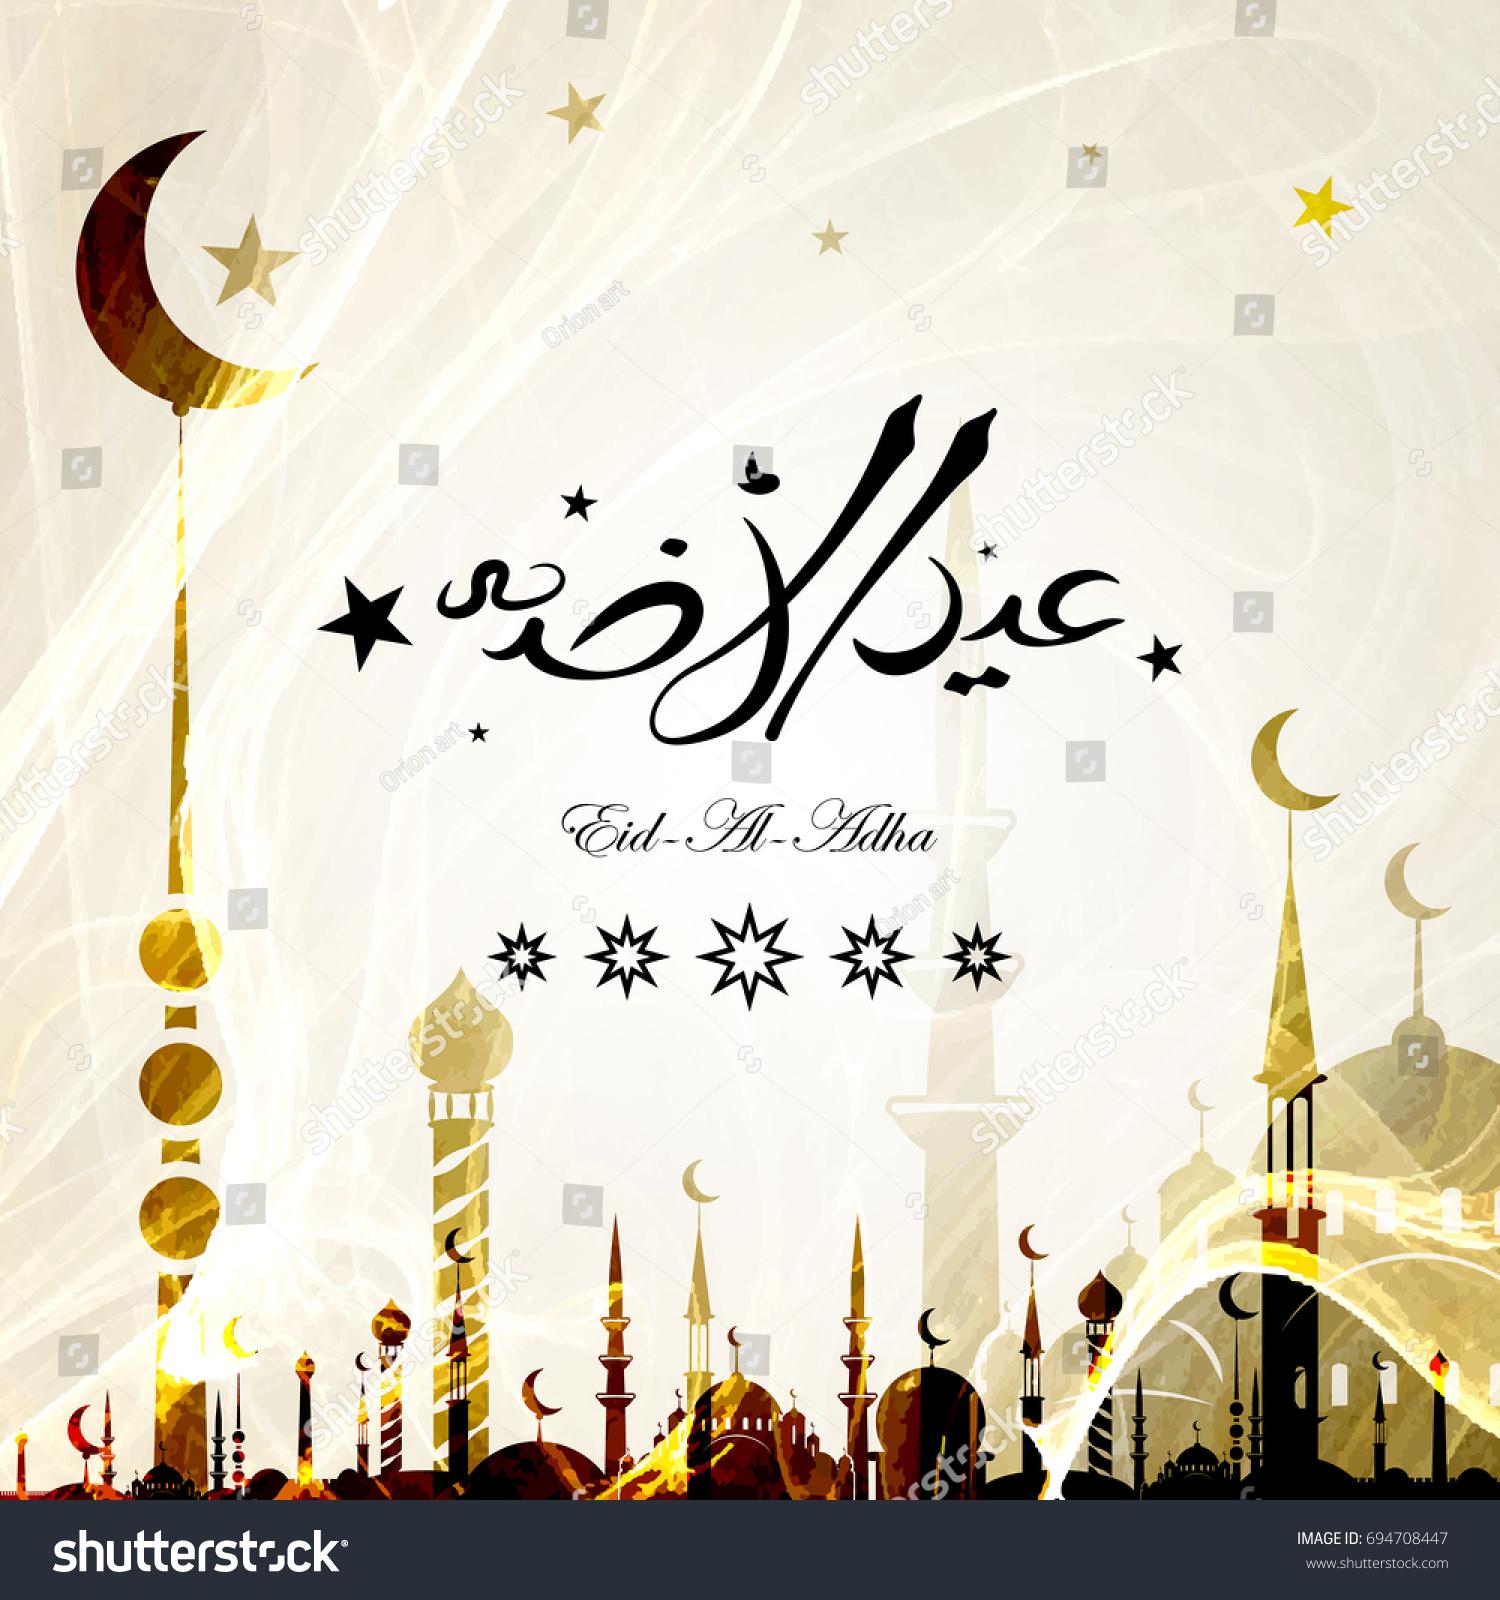 Eid Al Adha Greeting Cards Religious Stock Illustration 694708447